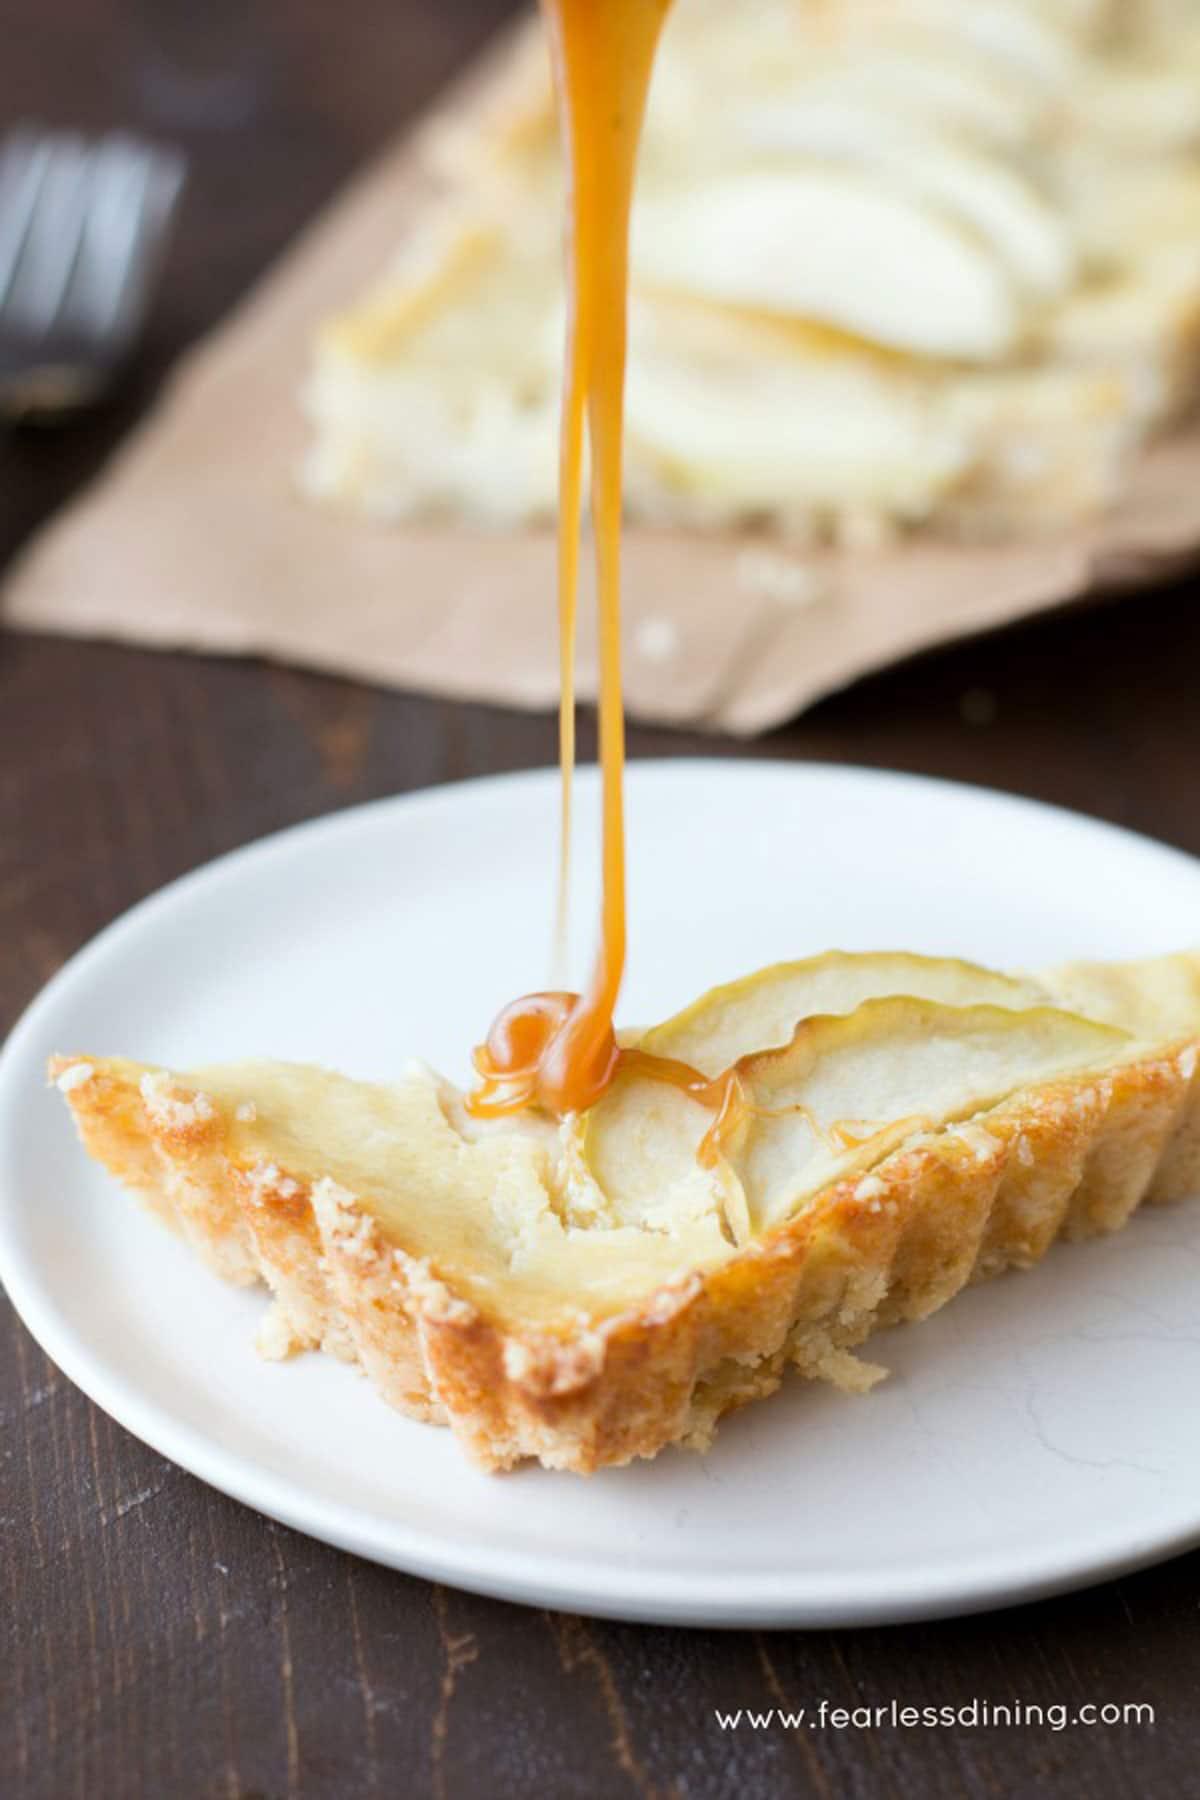 a slice of caramel apple tart on a plate